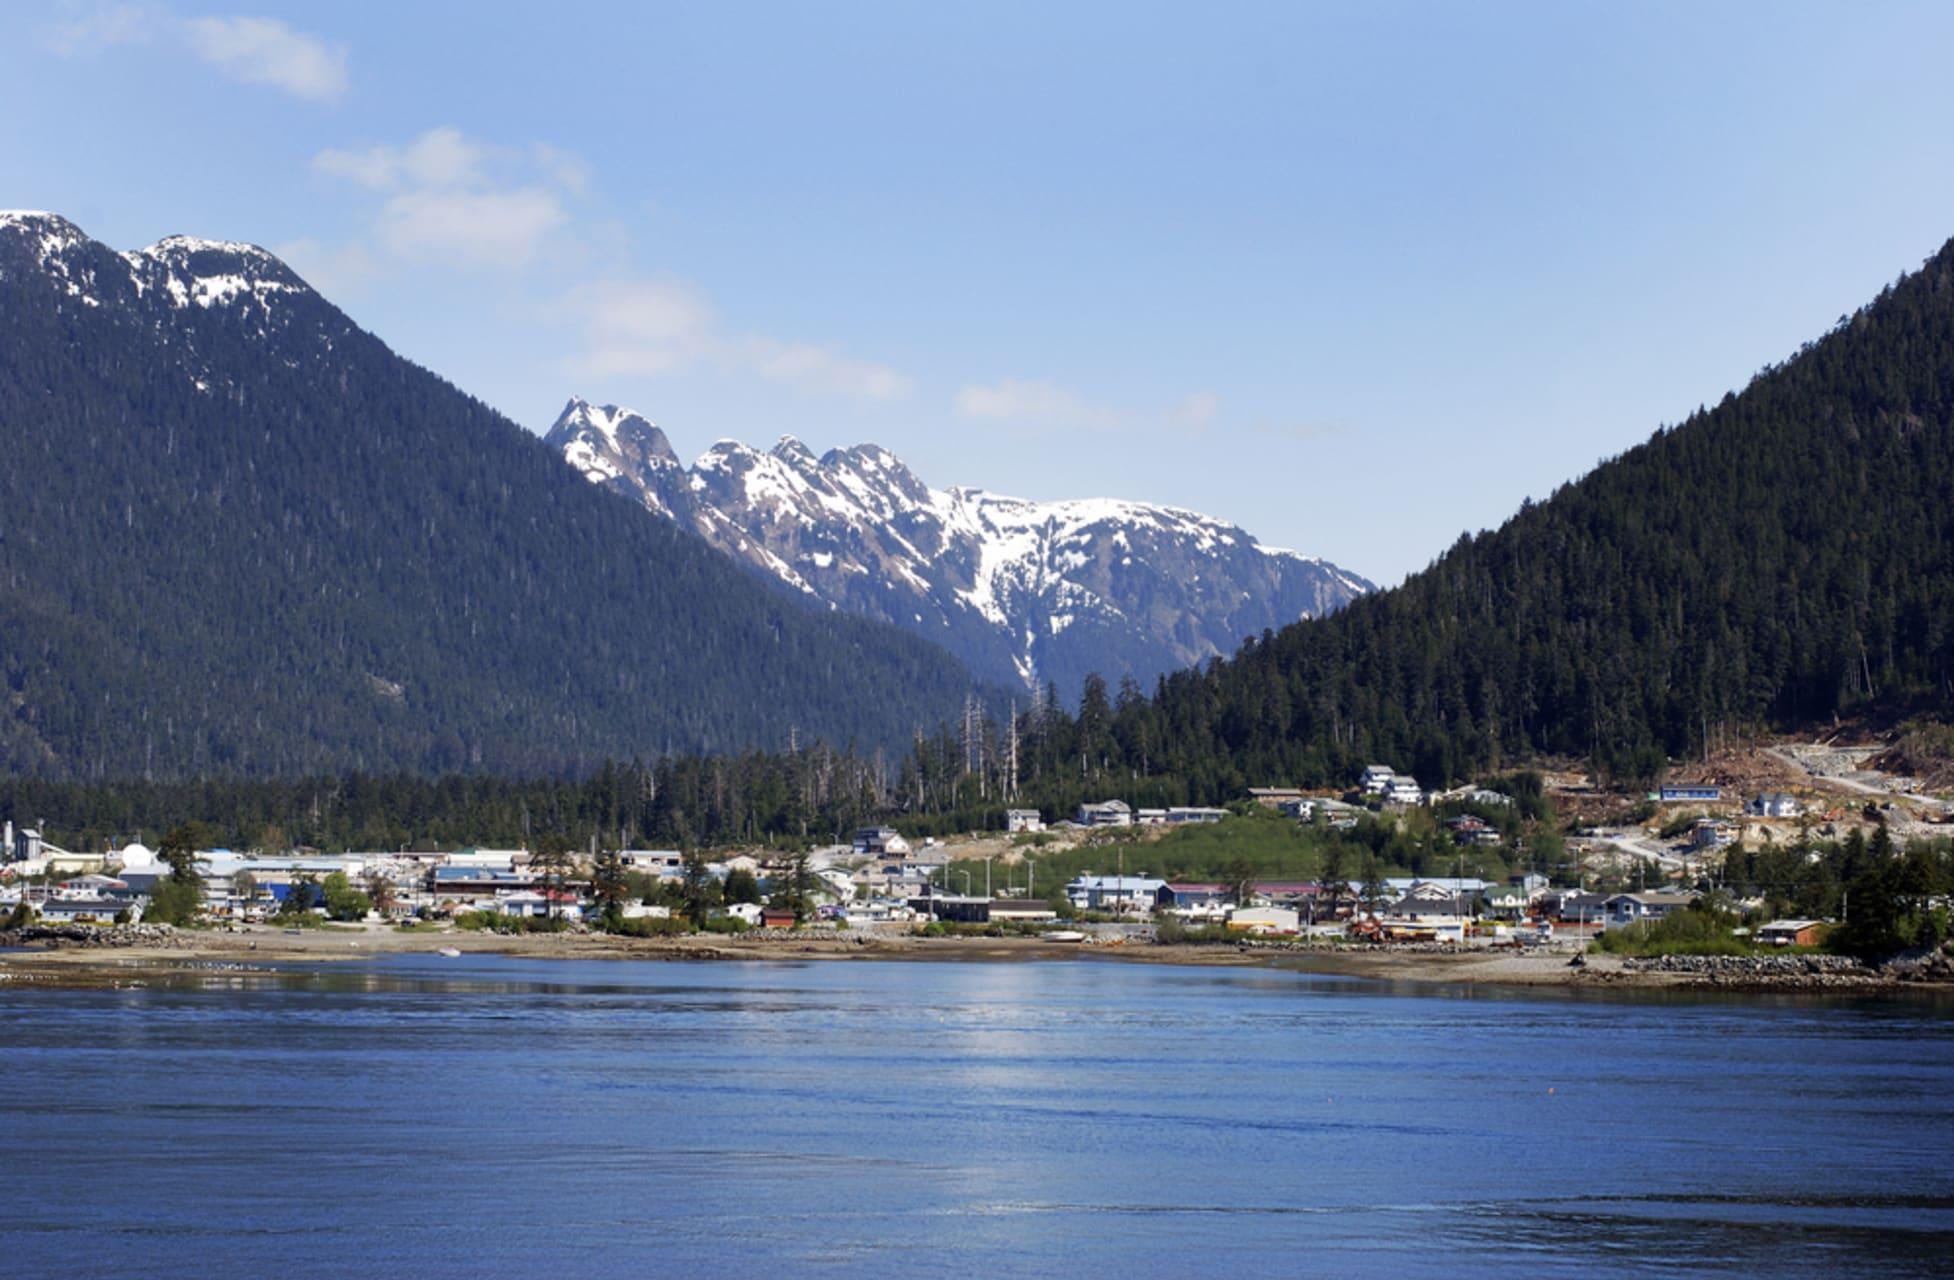 Sitka Alaska - Native Alaskan Culture meets Early Russian Influence